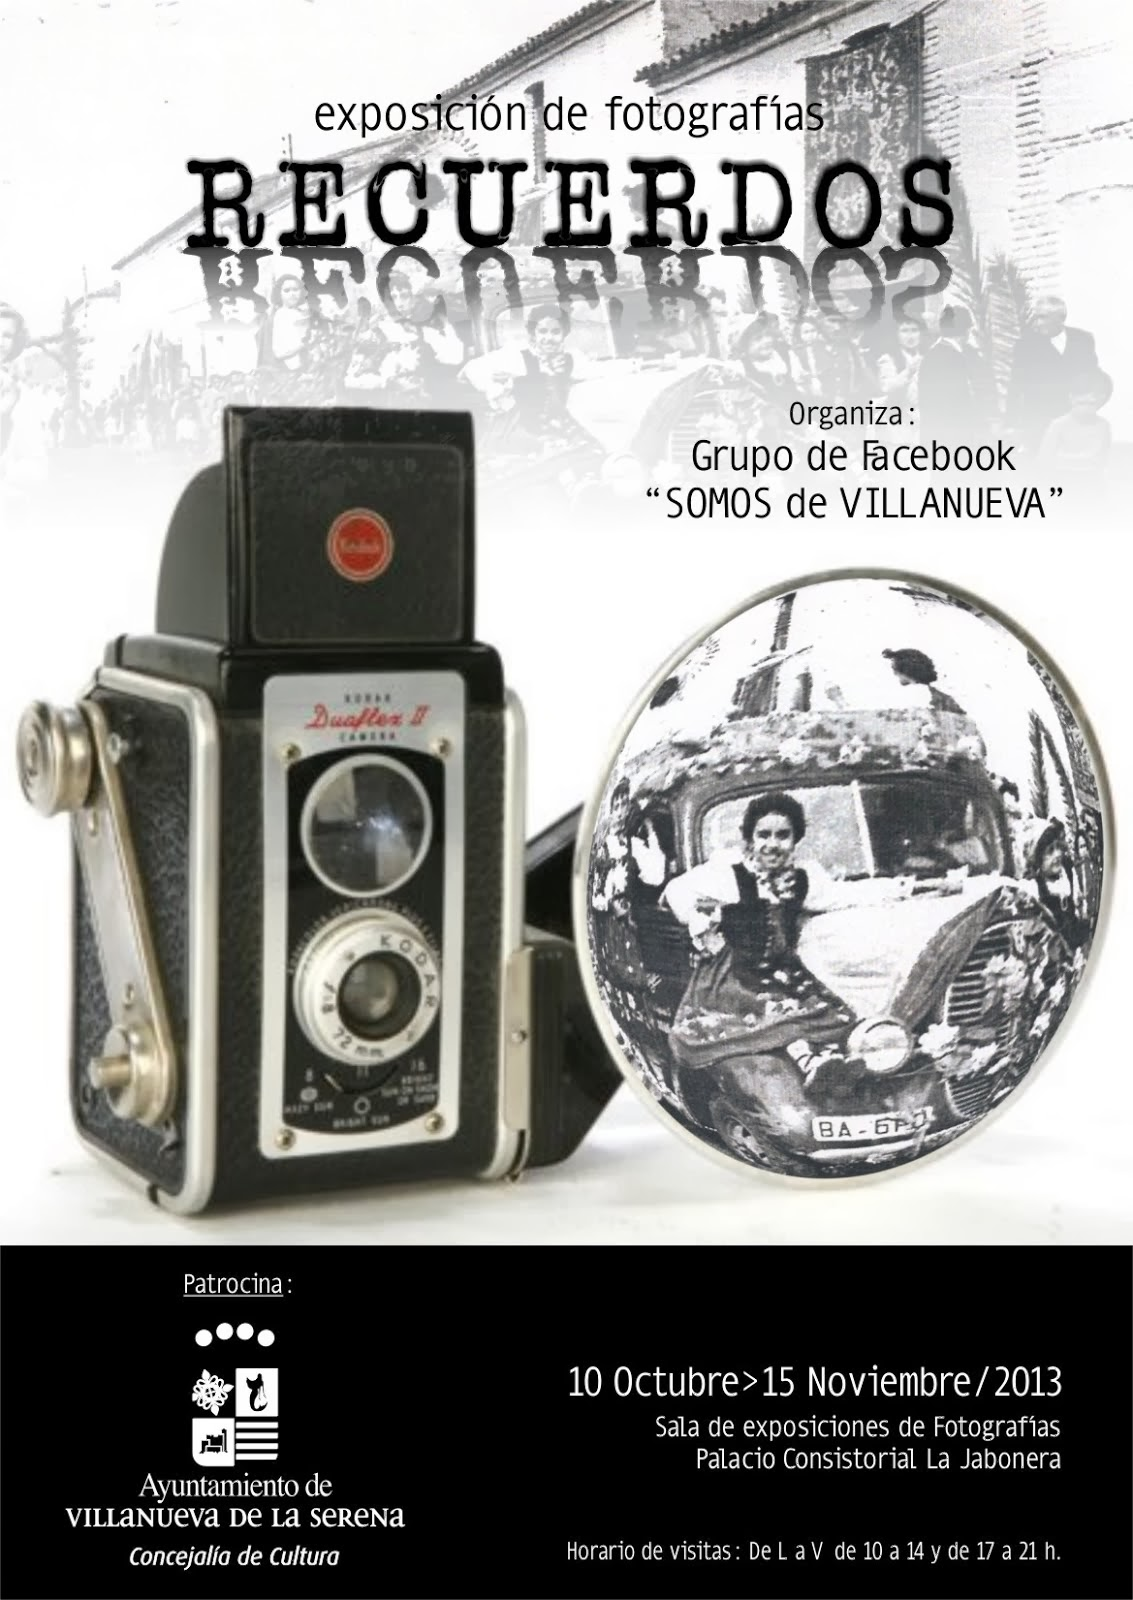 Recuerdos Exposición de Fotografías